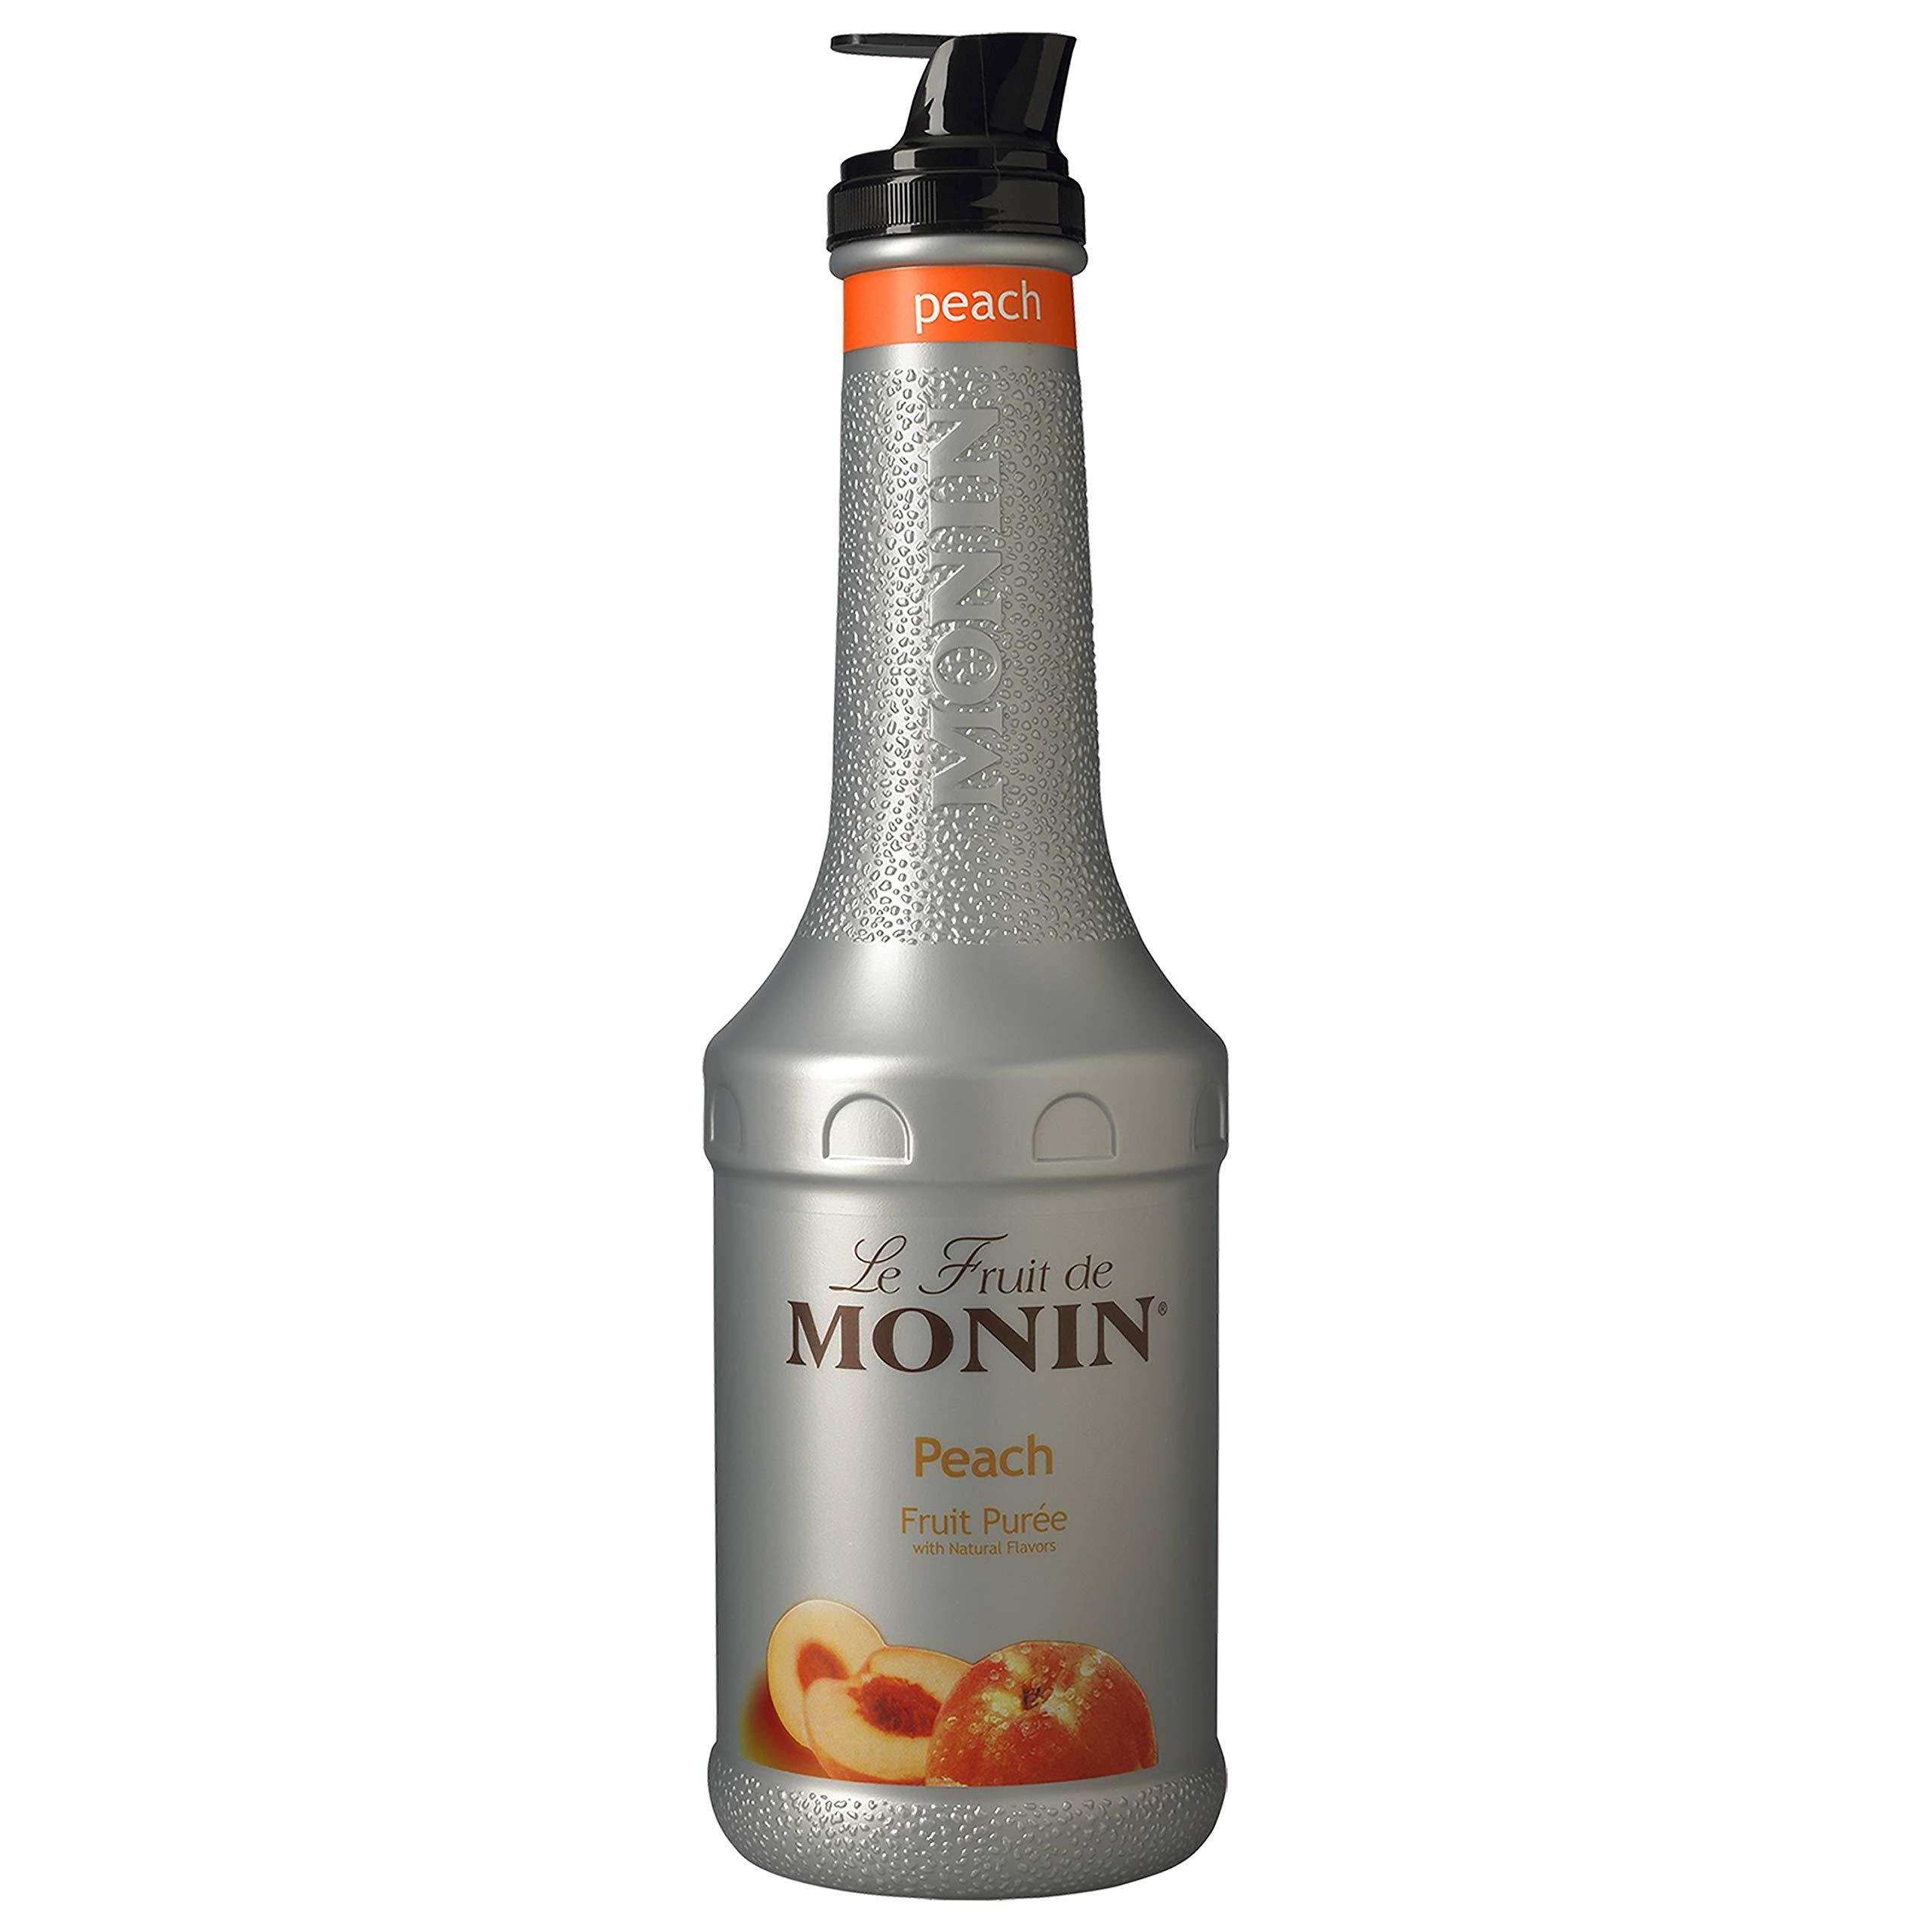 Monin Fruit Puree, Peach, 33.8-Ounce Bottles (Pack of 4)